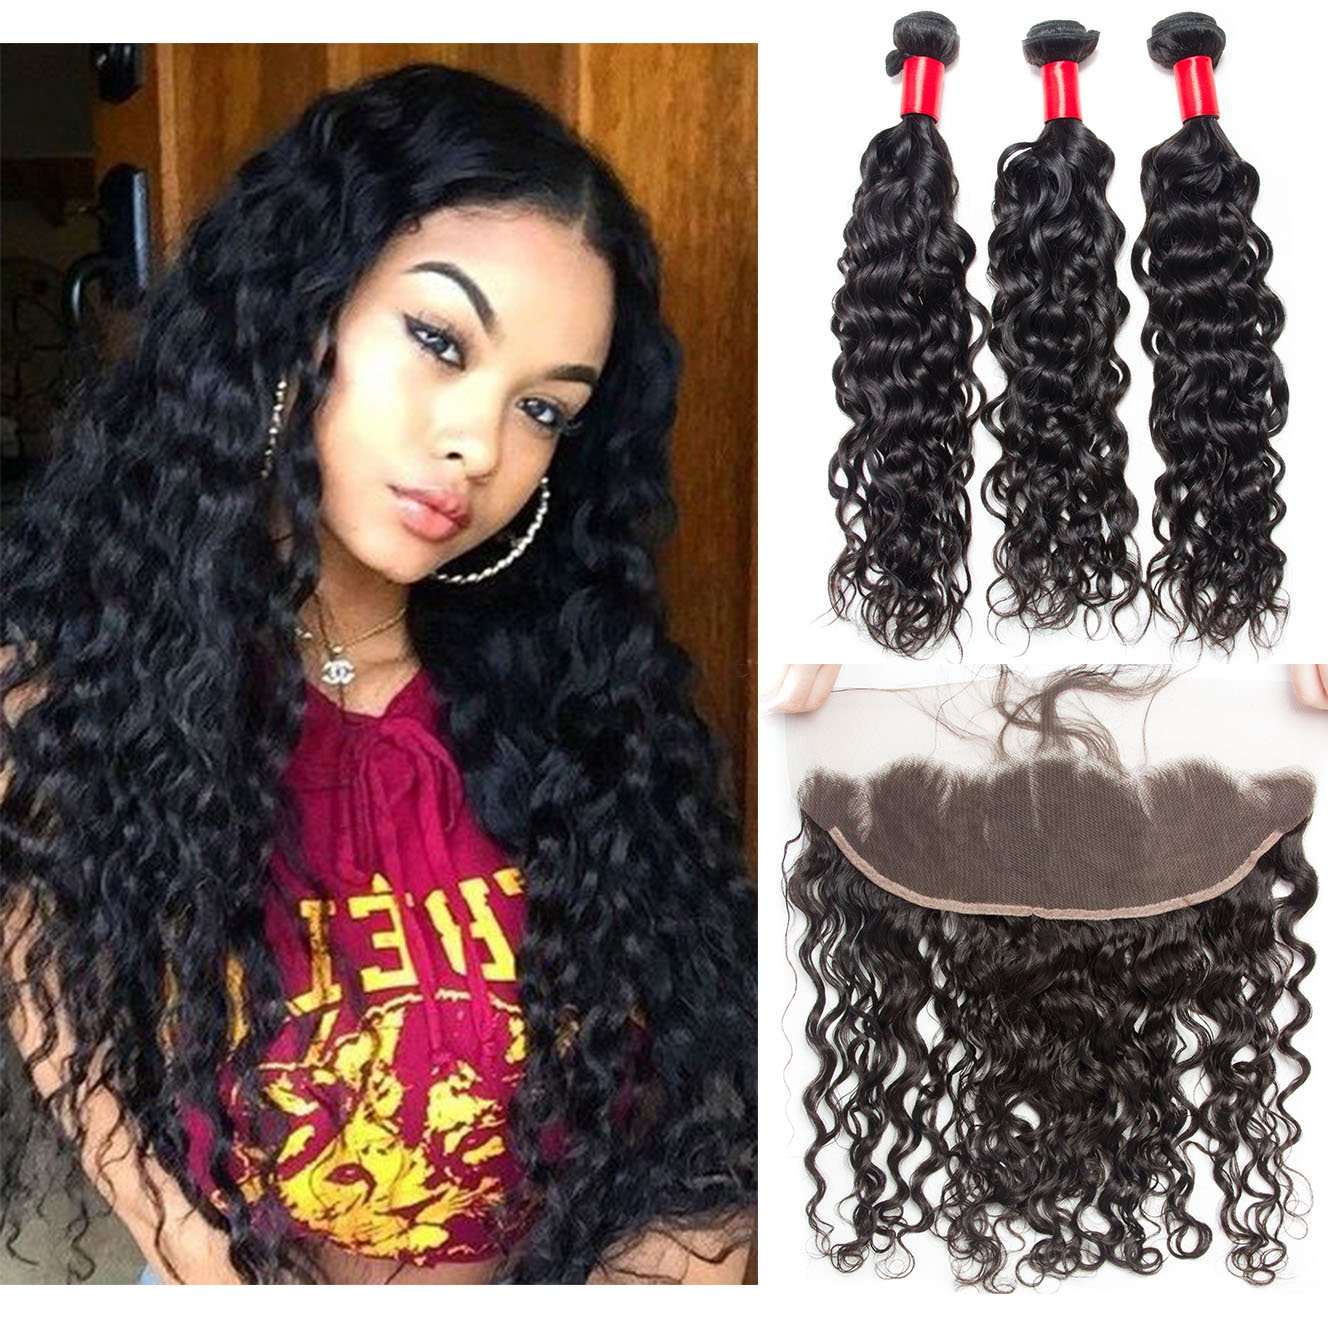 VIPbeauty Hair Bundles with Frontal Best Virgin Brazilian Hair Bundles Black Hair Water Wave Frontal Lace Closure with Bundles (10 12 14+10)